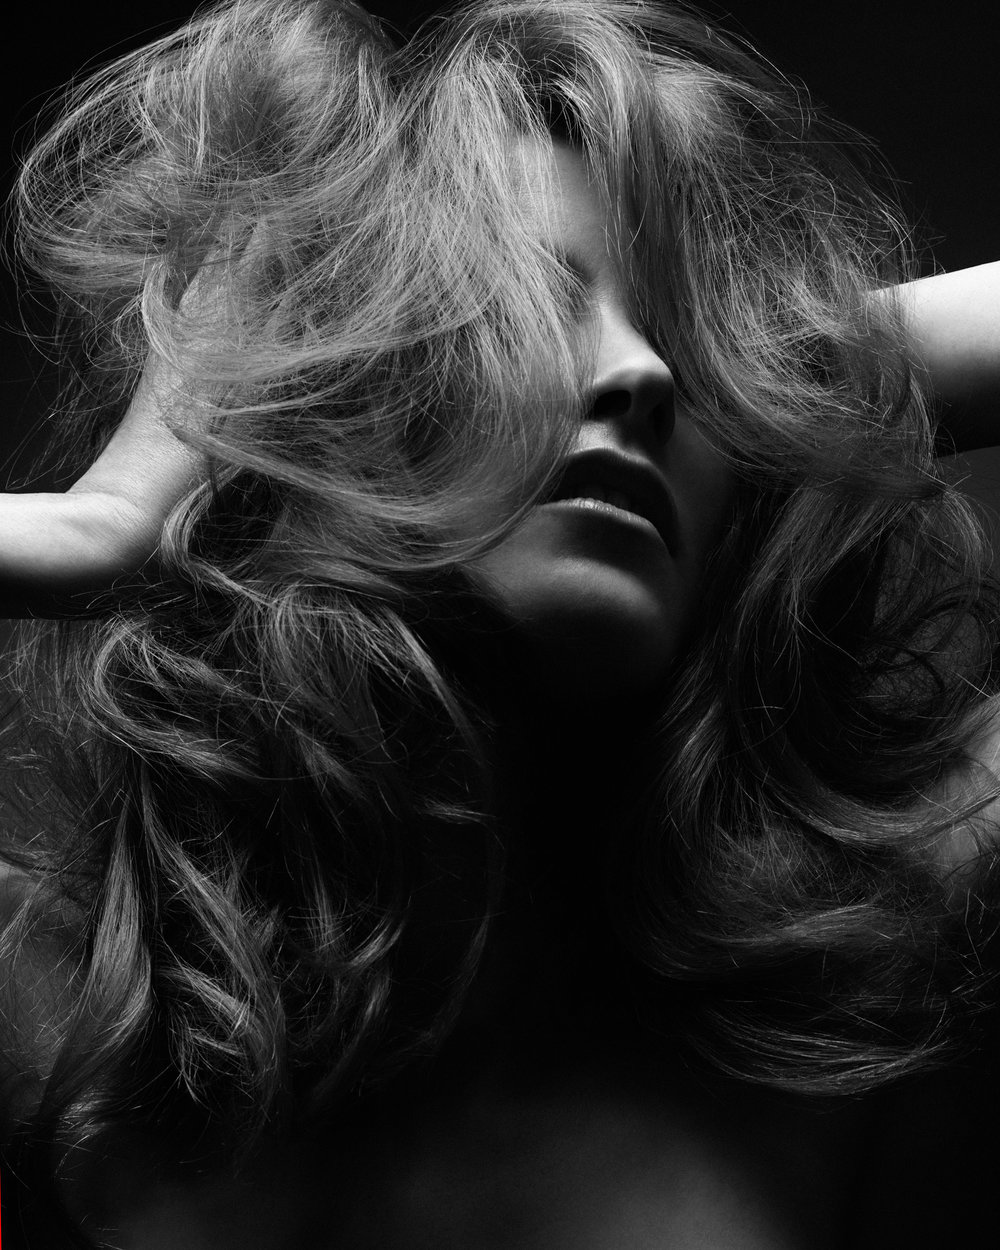 Jack_Eames_Andrew_Barton_Black_White_Hair_Beauty_Photographer_London_02.jpg